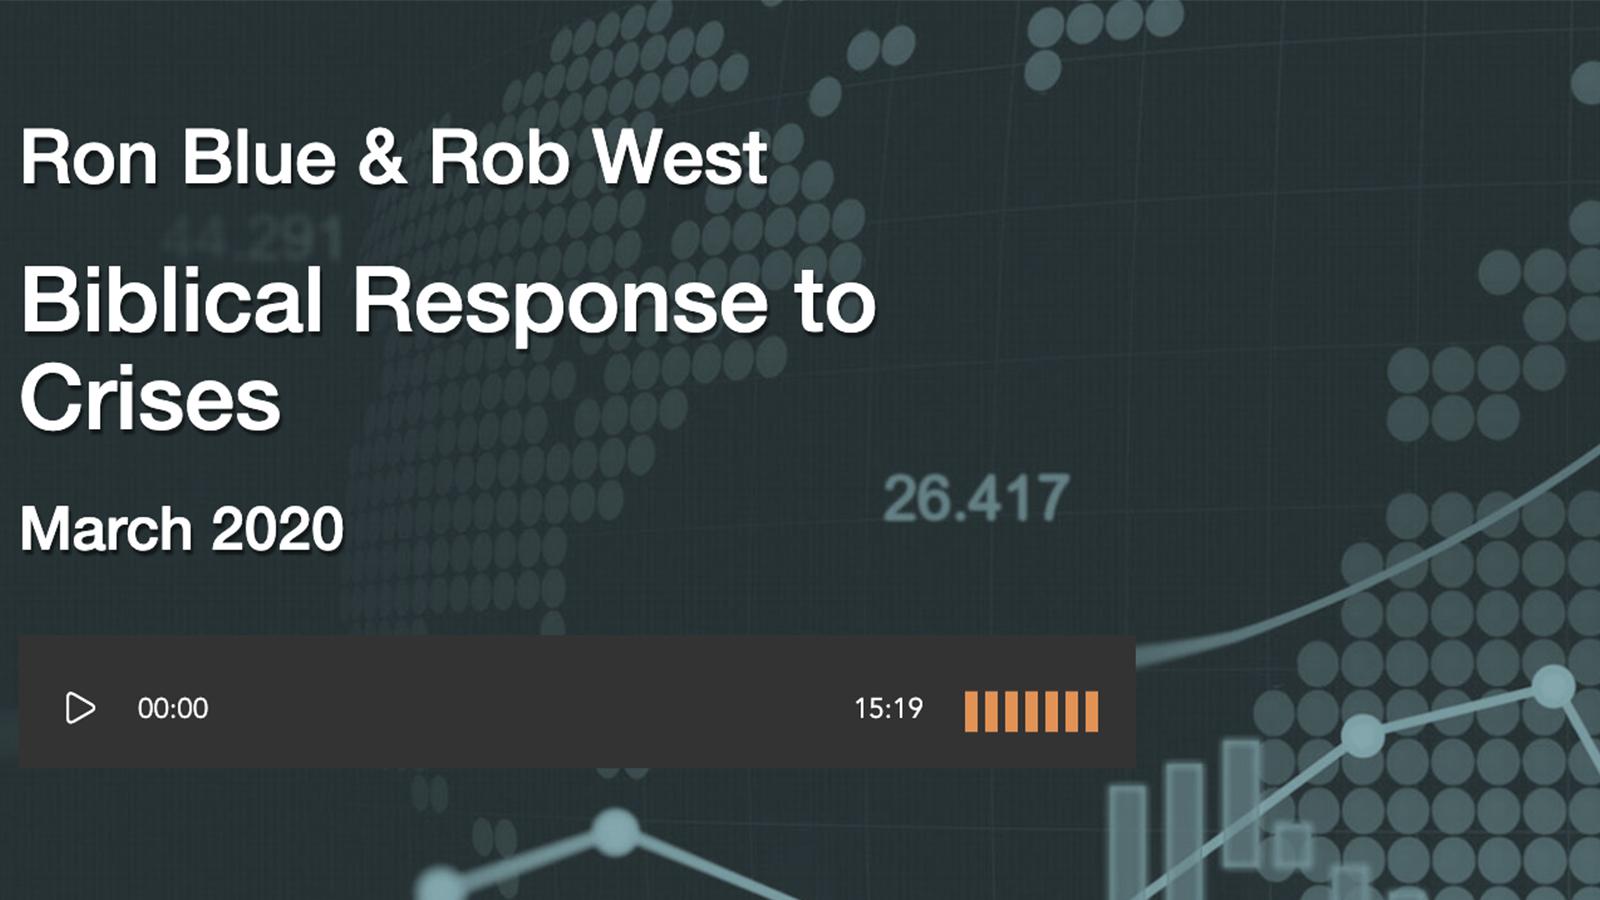 Ron Blue Rob West Biblical Response to Crisis Image